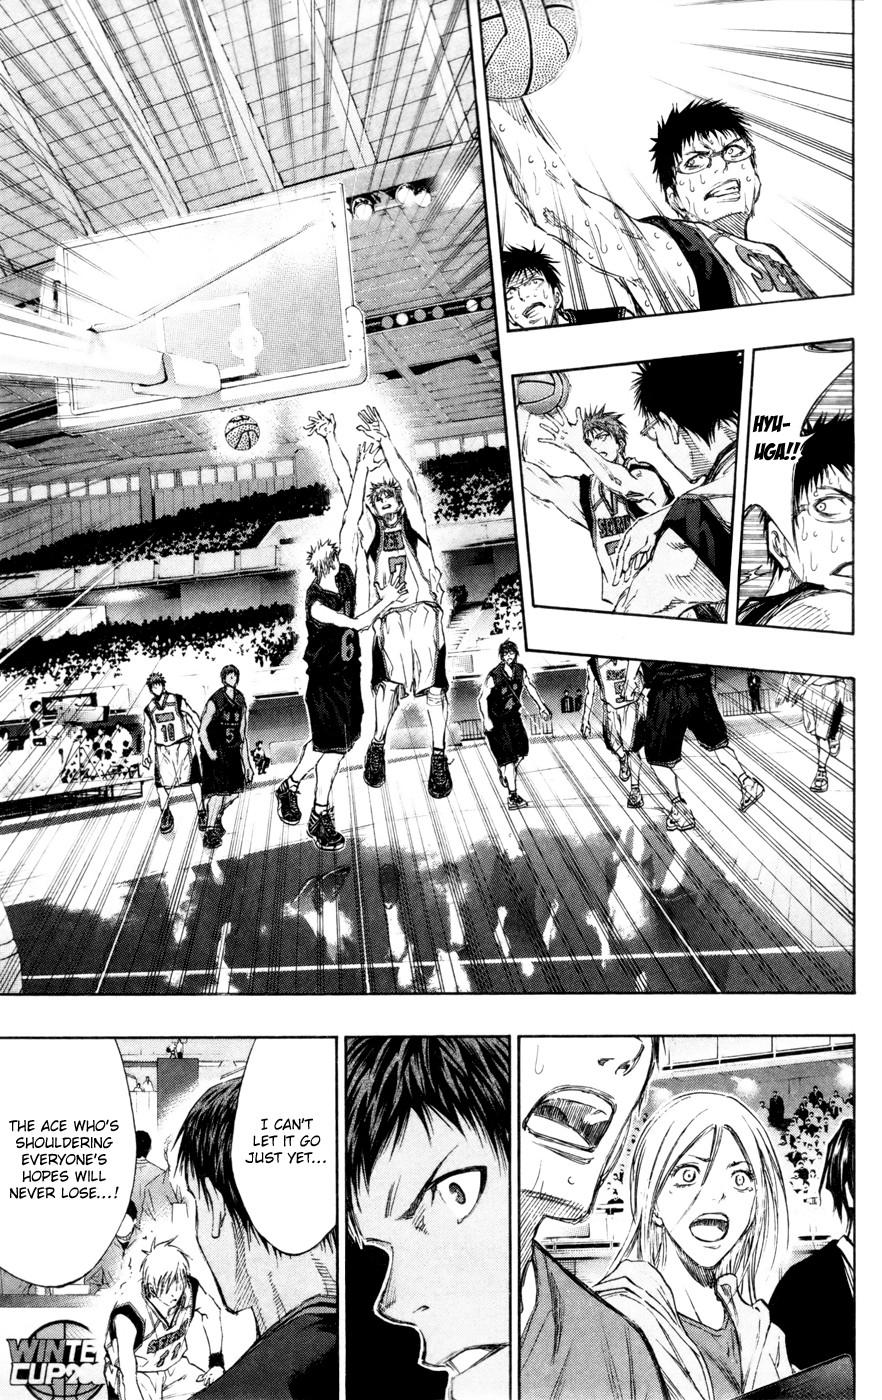 Kuroko no Basket Manga Chapter 135 - Image 11